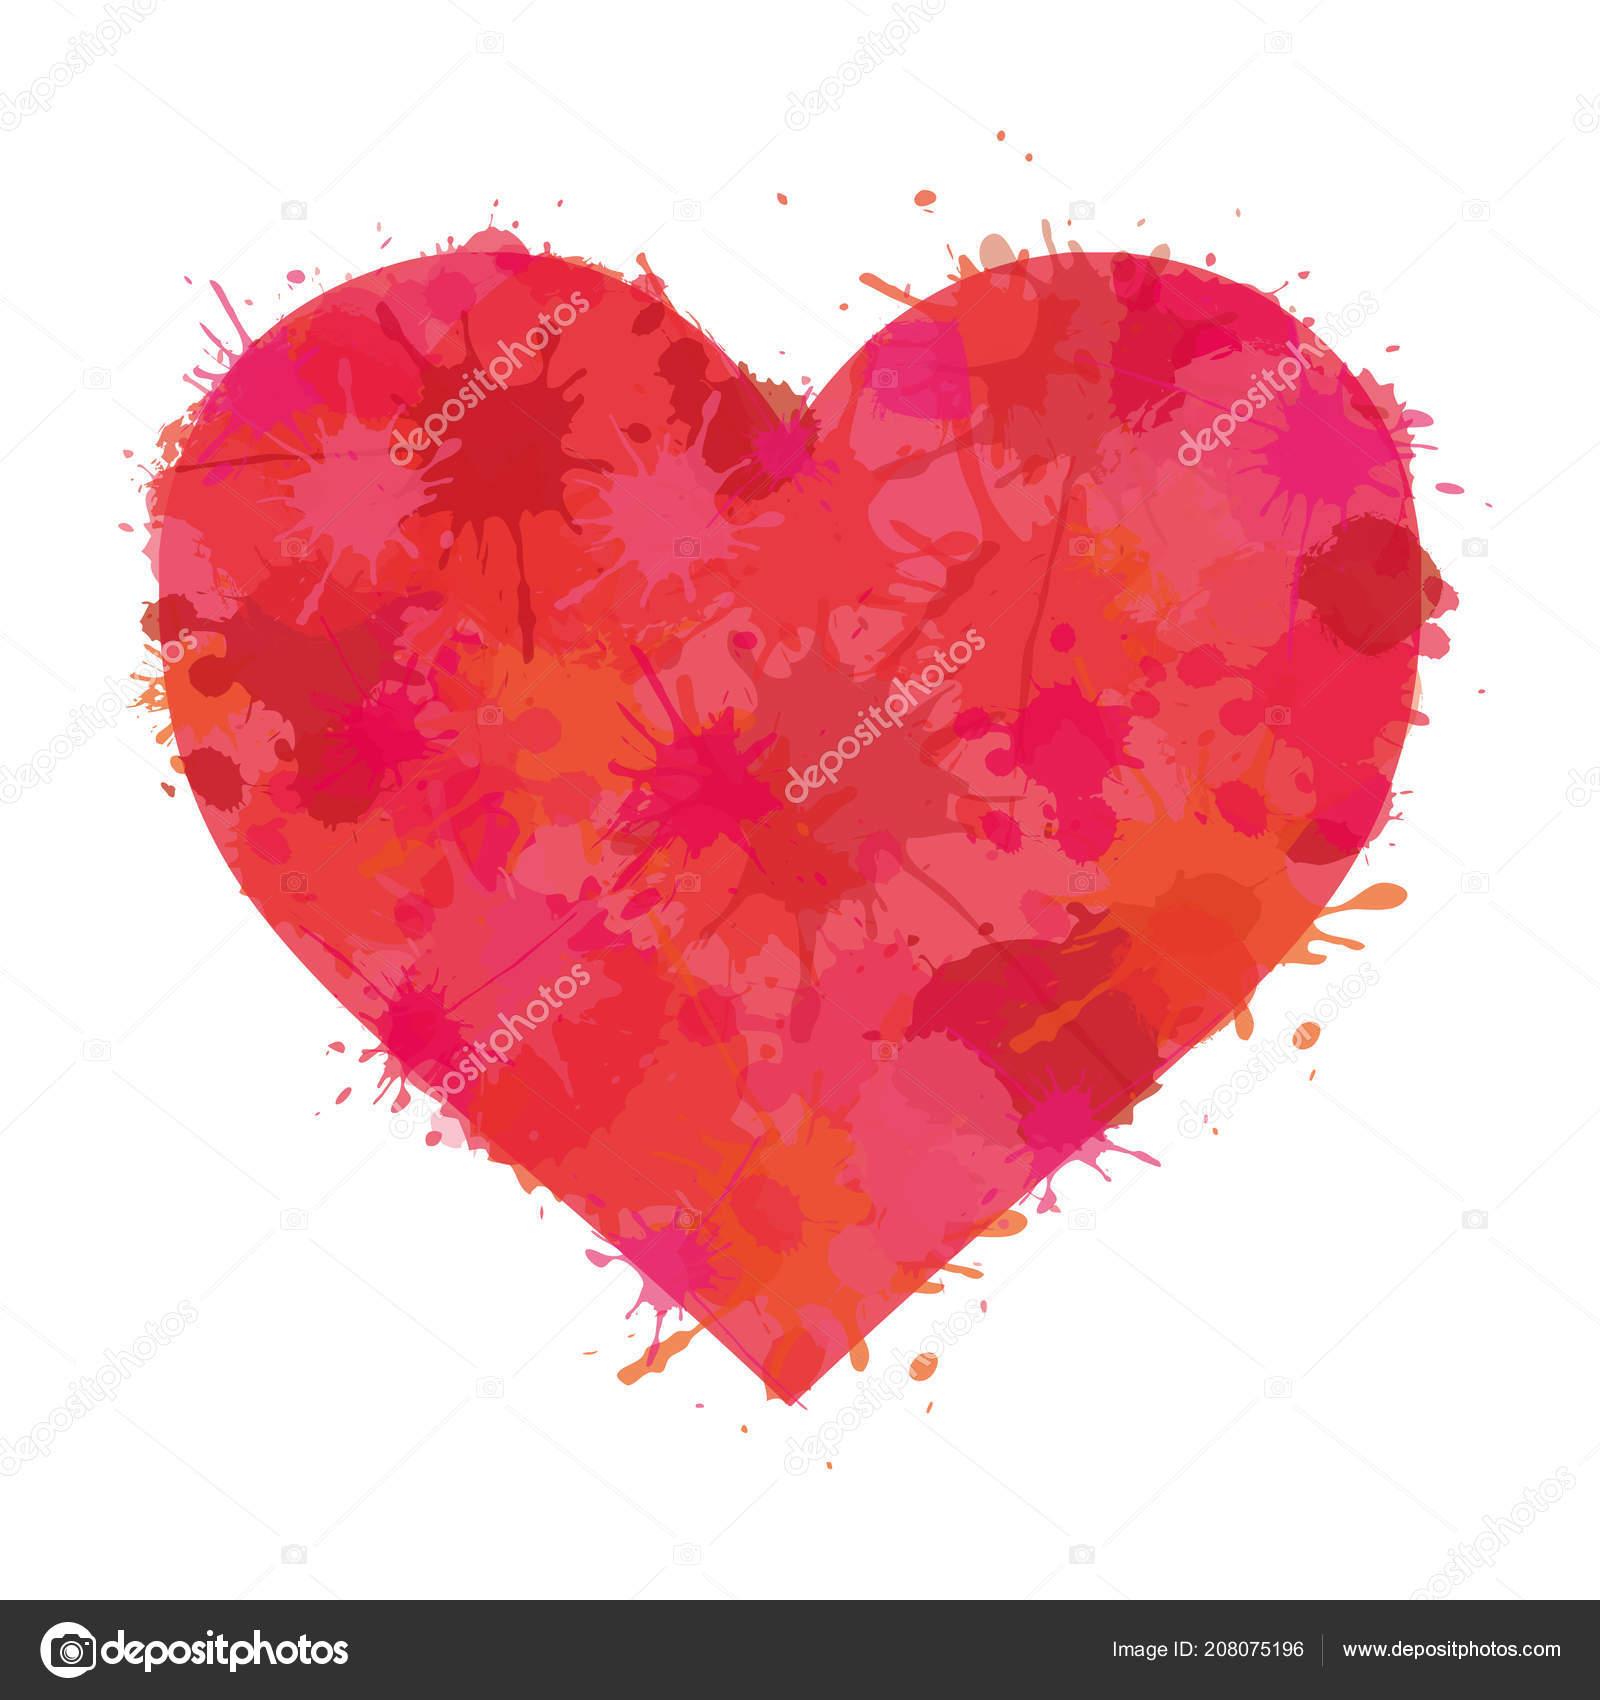 Heart Watercolor Paint Illustration Splatter Love Icon Sign Symbol